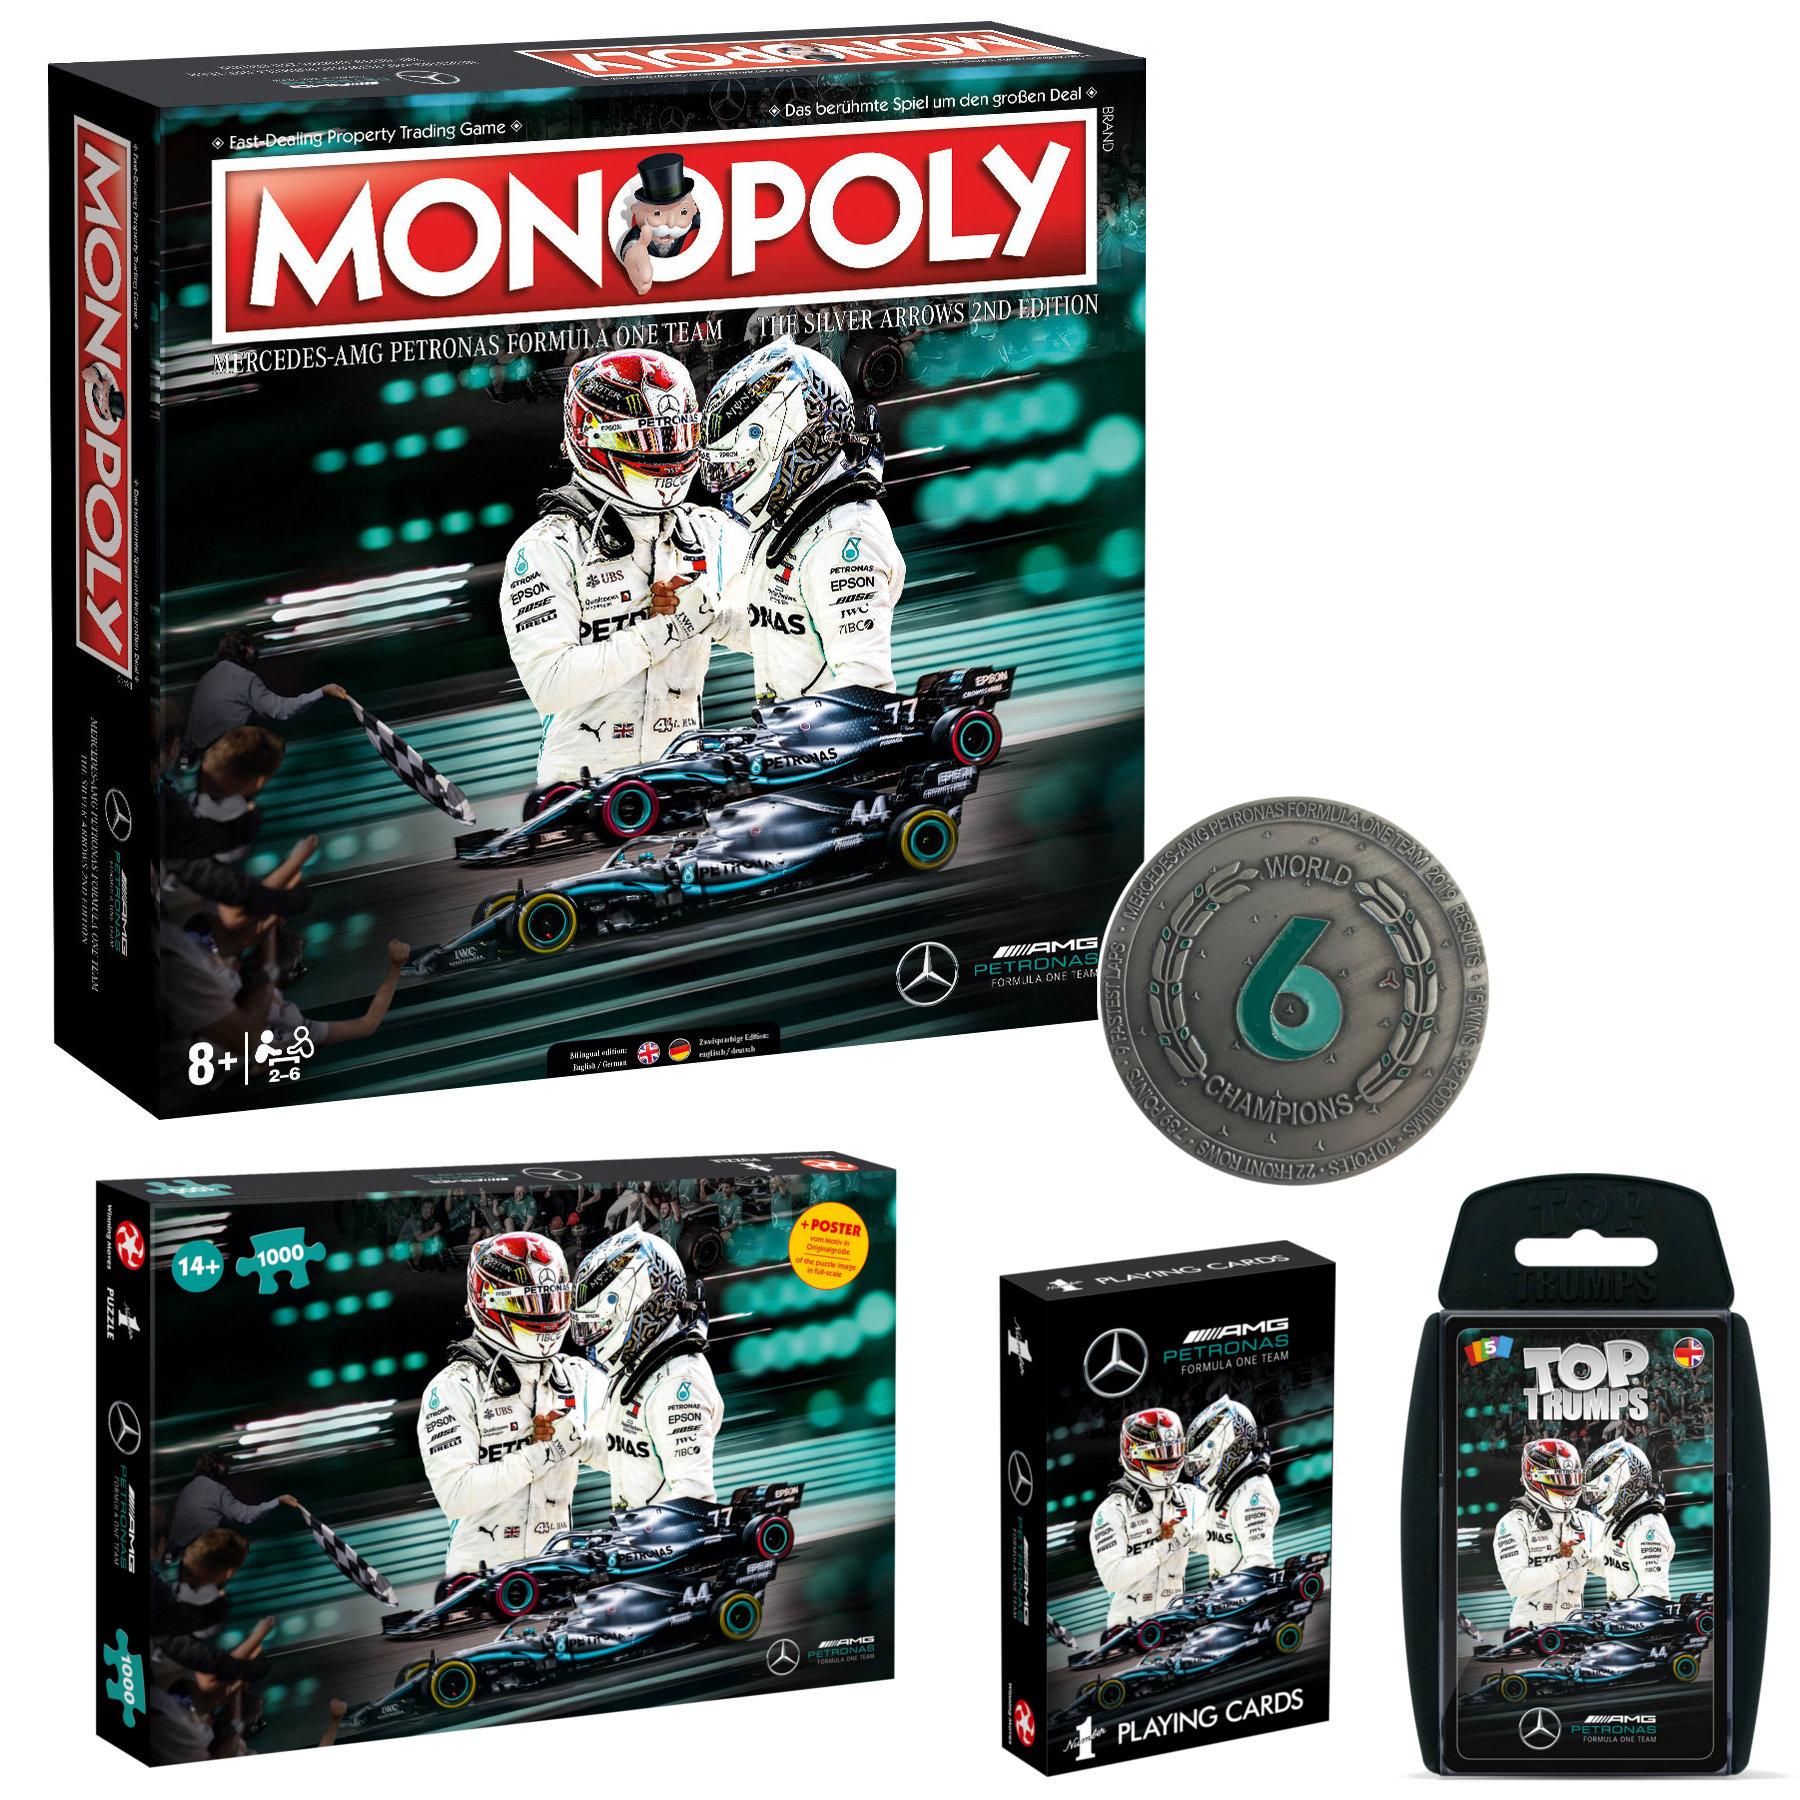 Mercedes Spielepaket: Monopoly + Coin + Spielkarten + Top Trumps + Puzzle